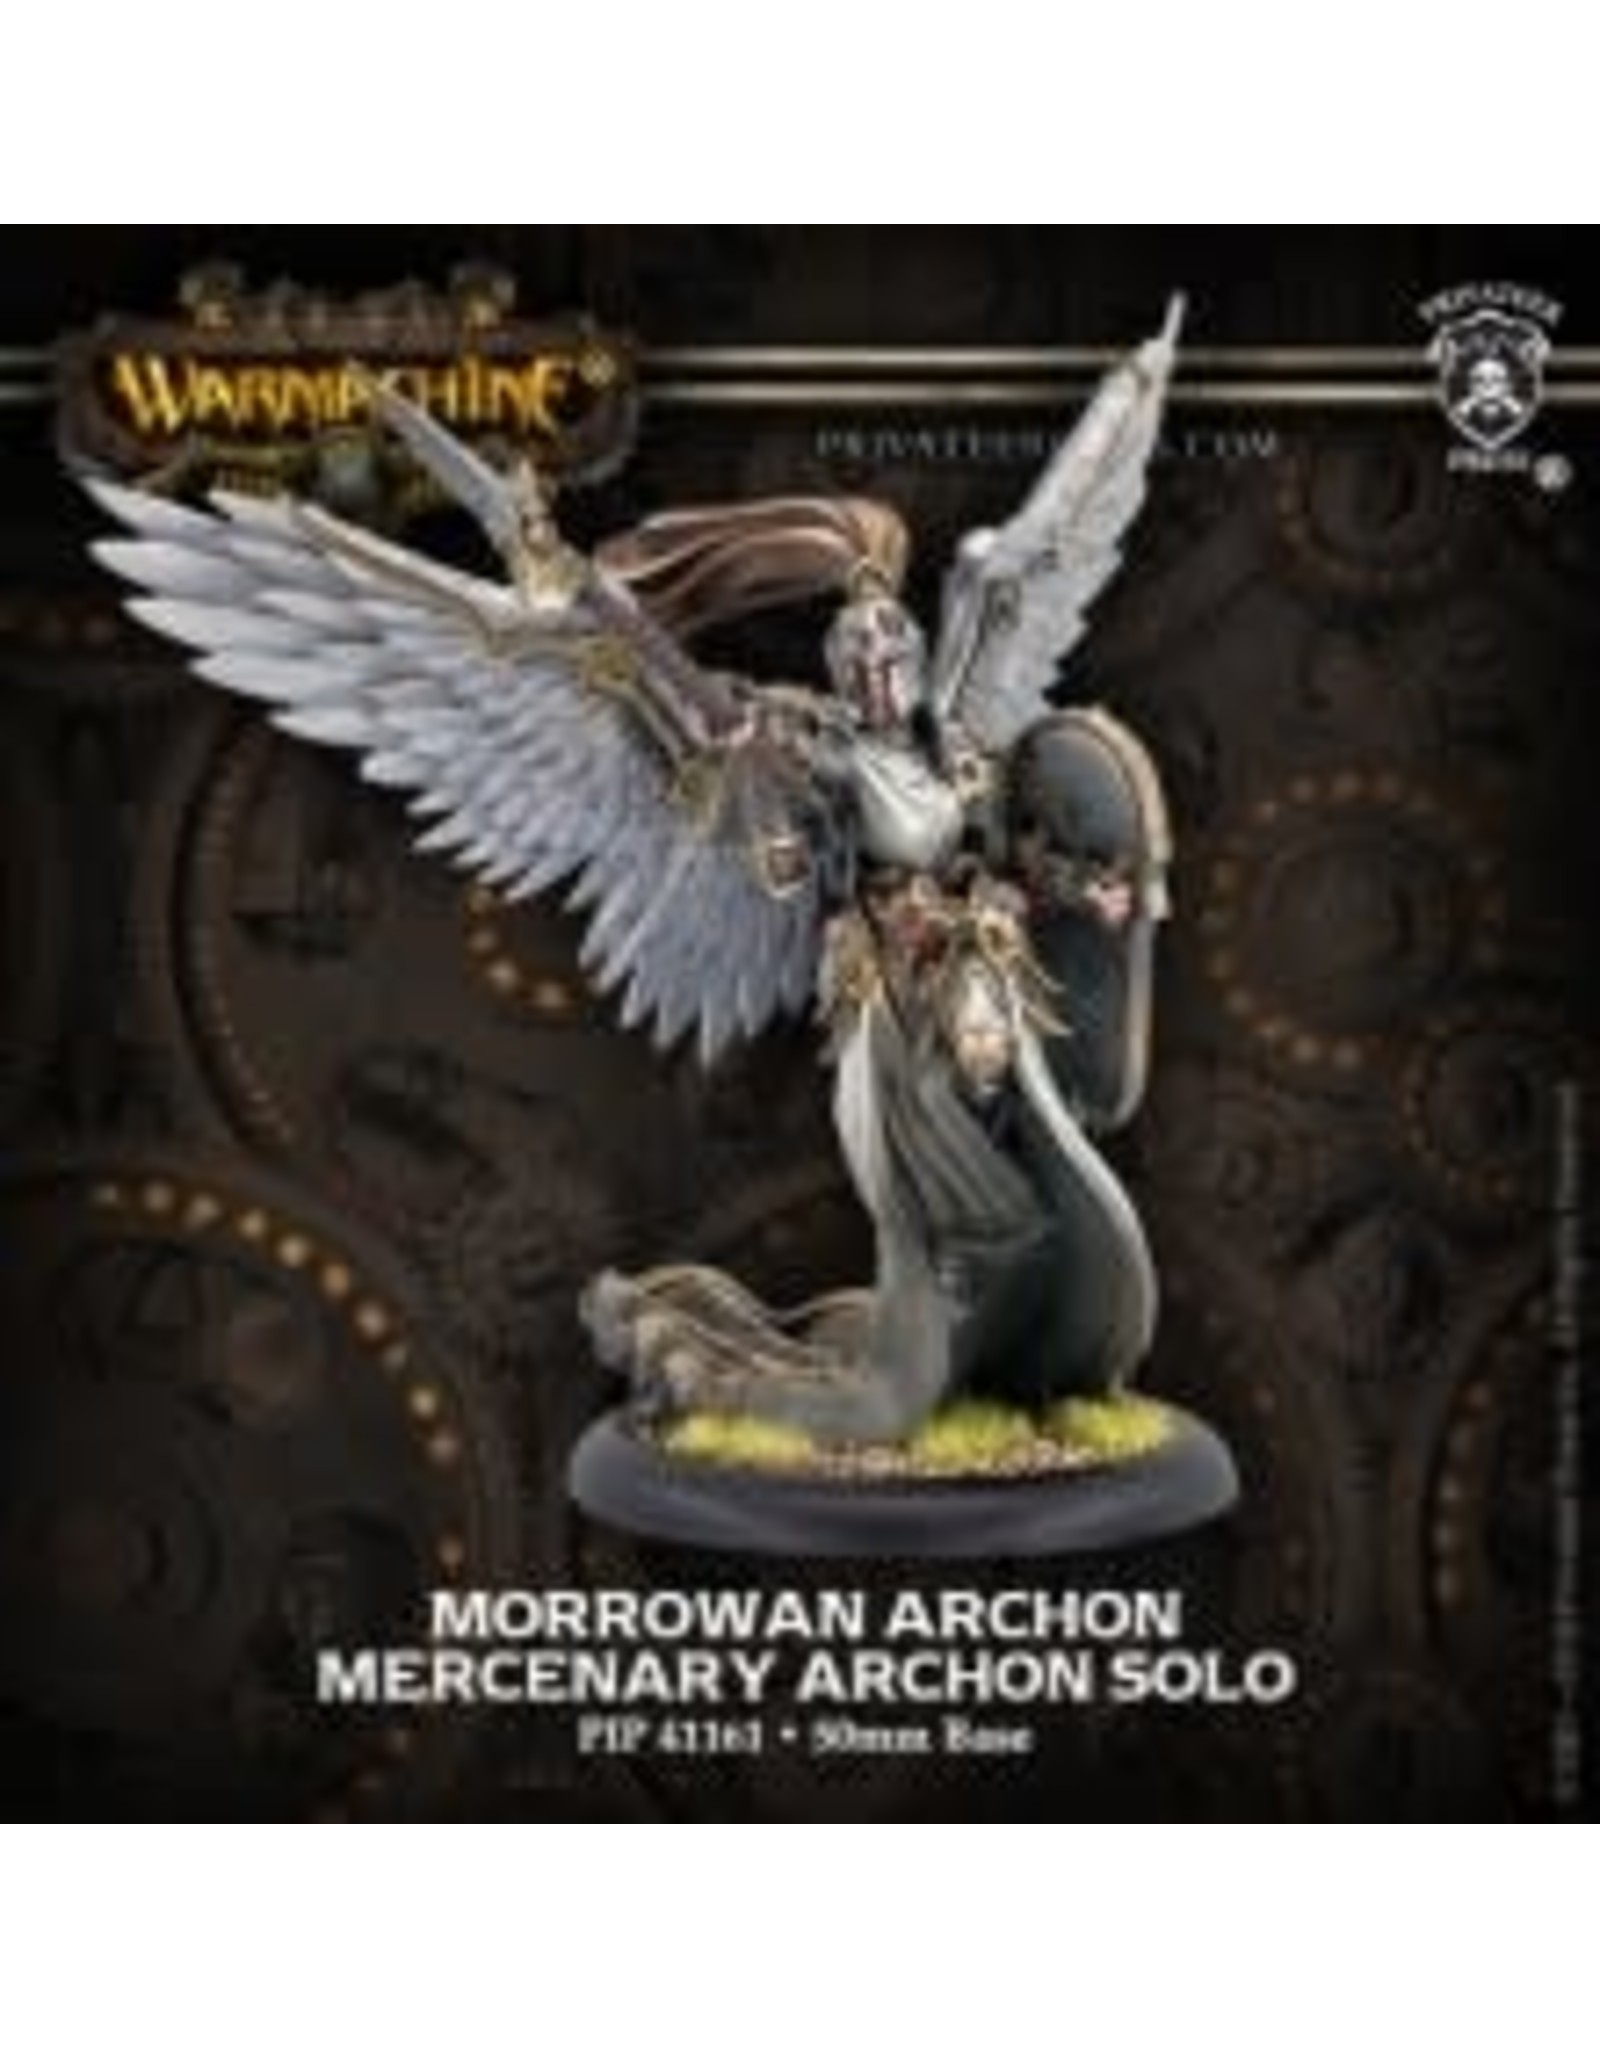 Privateer Press Warmachine: Mercenaries Morrowan Archon Solo